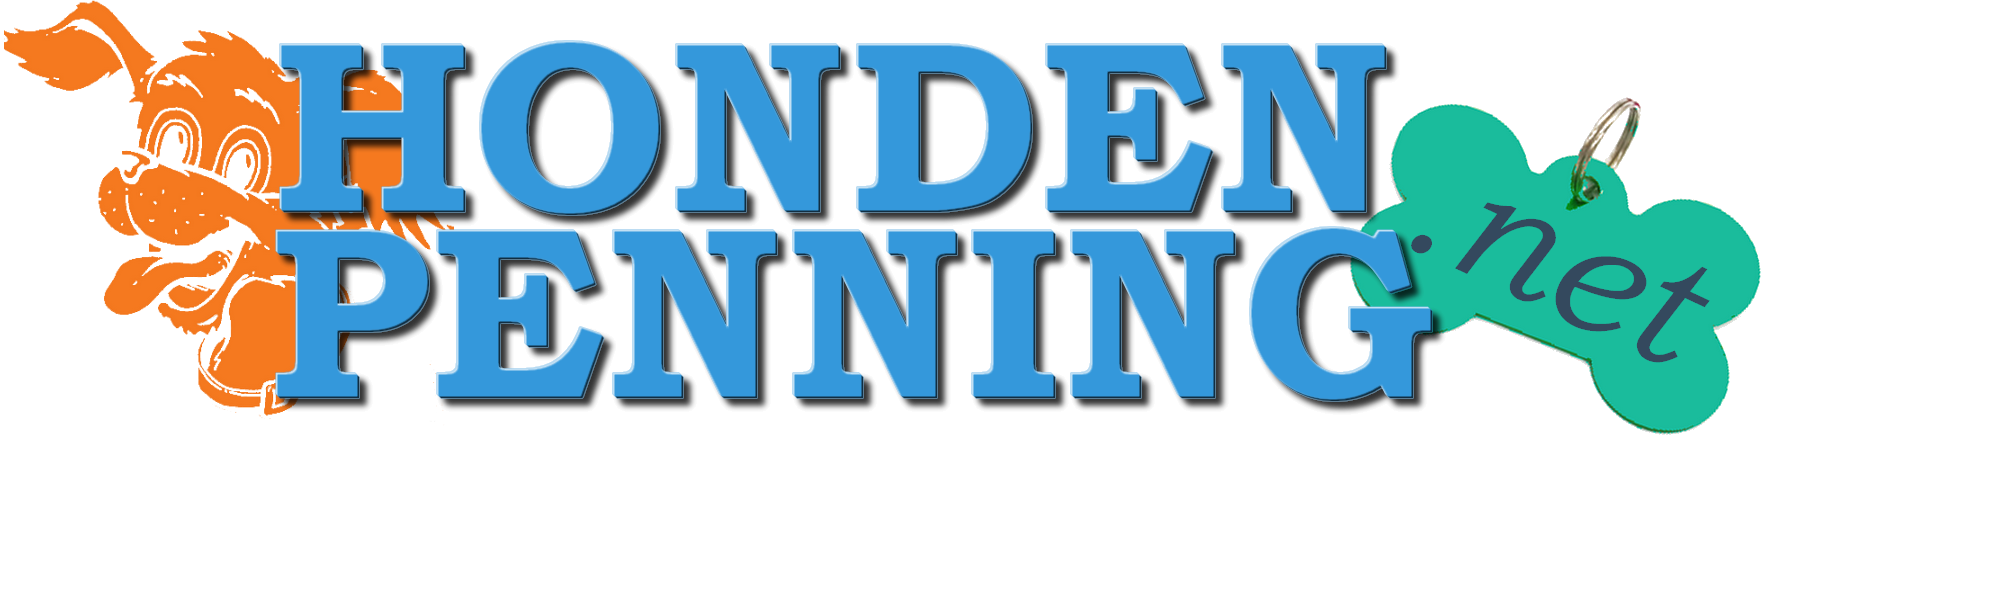 Logo Hondenpenning.net transparantie achtergrond voor factuur 2